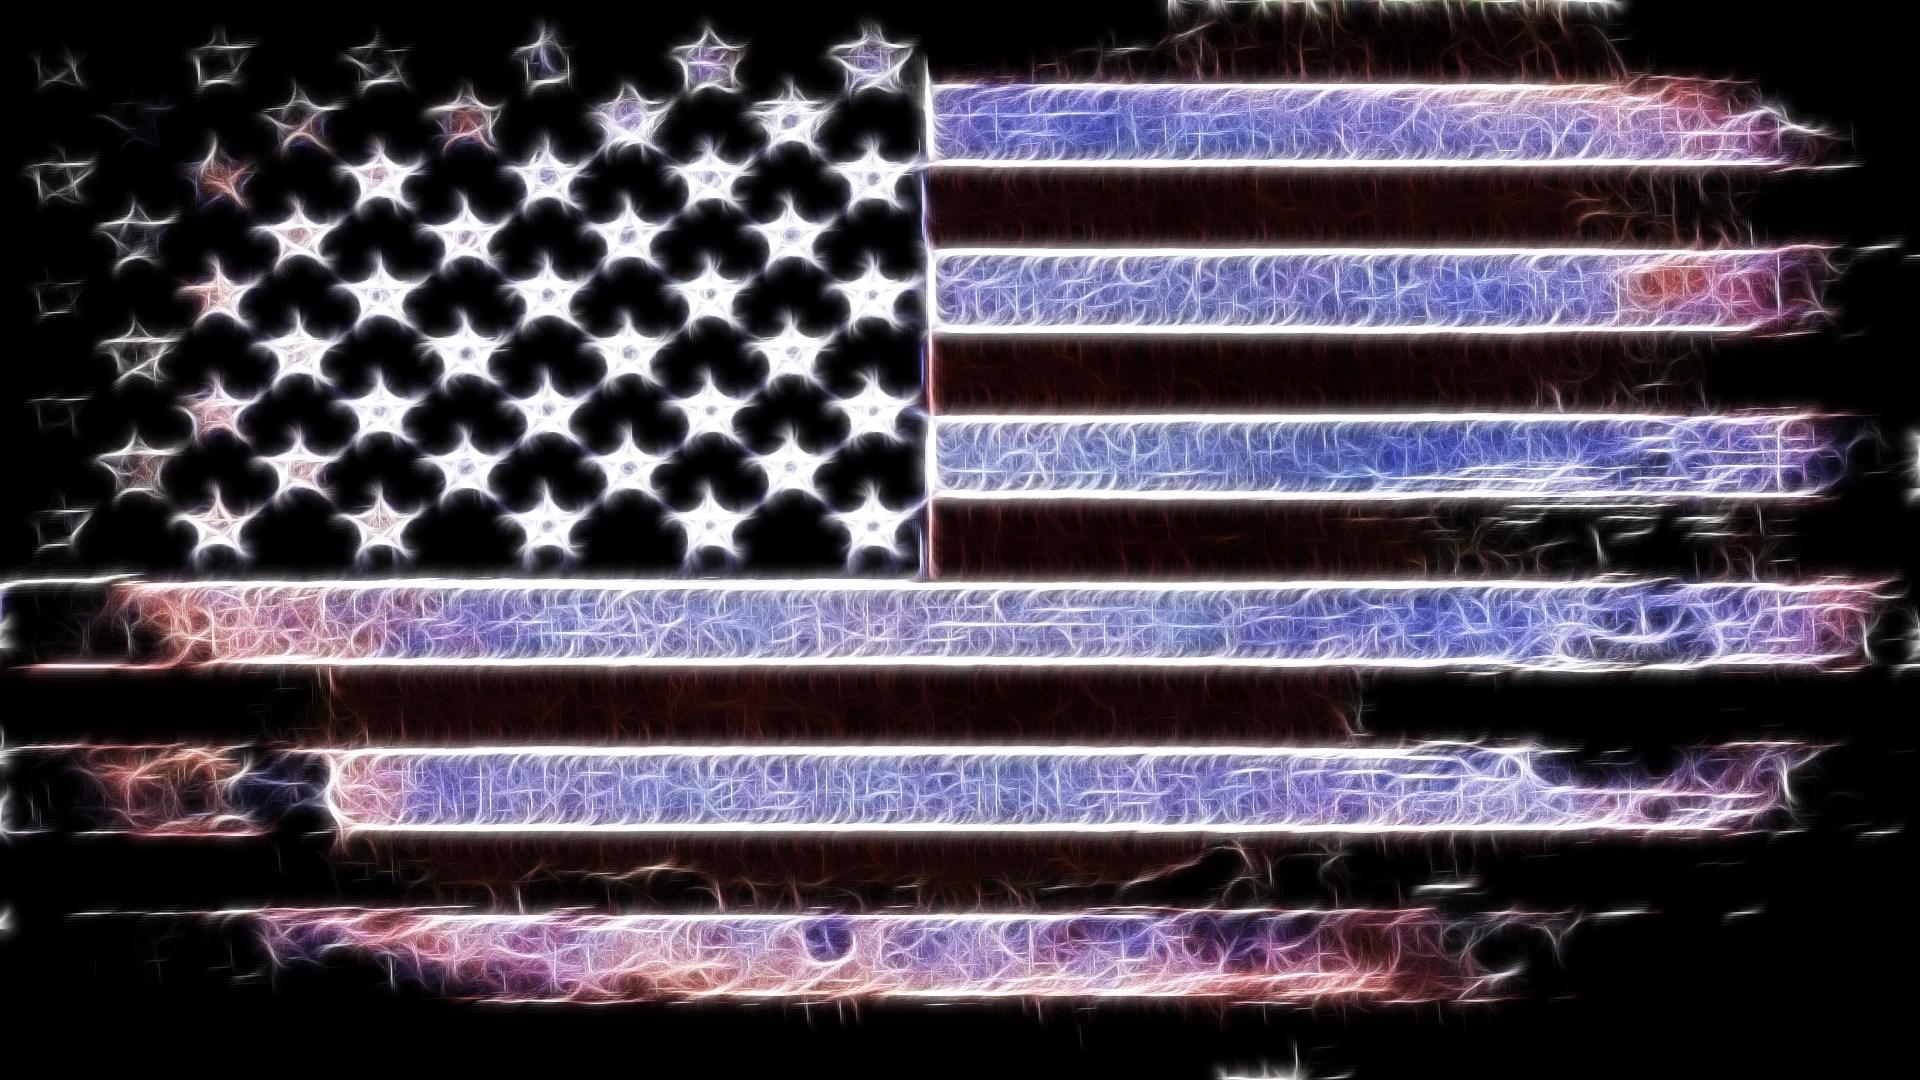 american-flag-hd-pack-Finch-Butler-wallpaper-wpc9202361